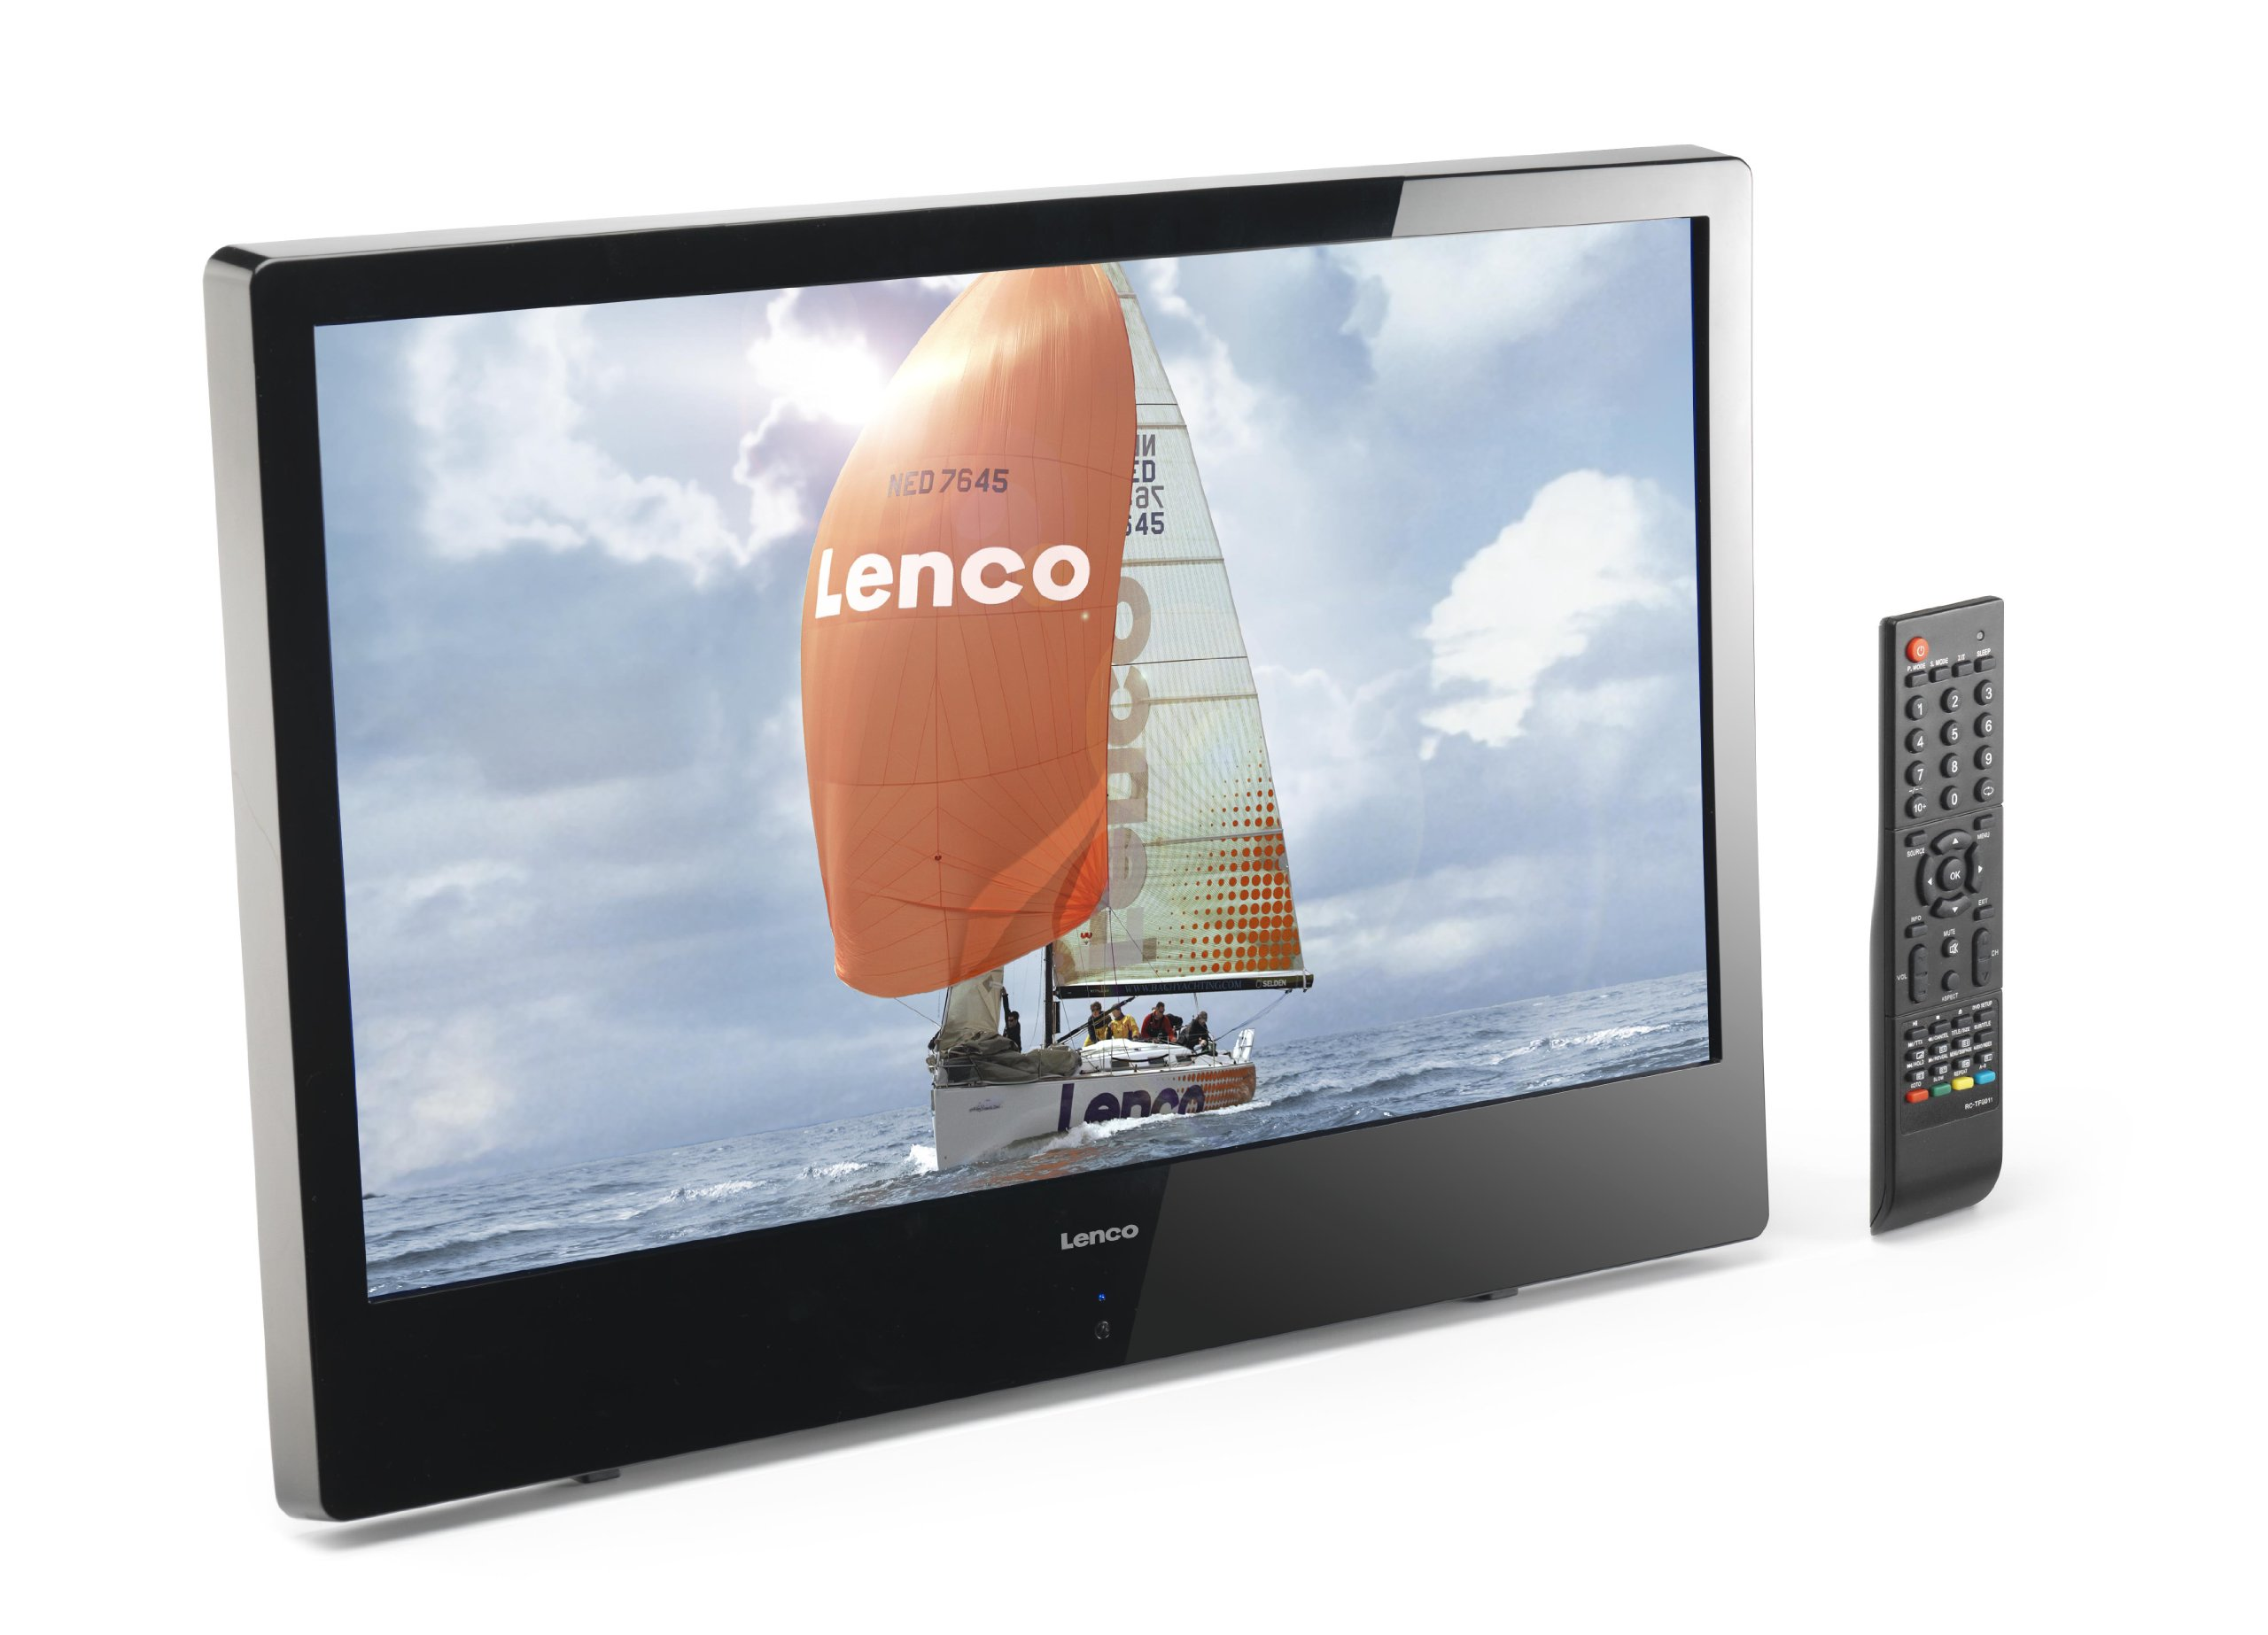 Lenco TFT de 1537 40 cm (televisor, 50 Hz): Amazon.es: Electrónica